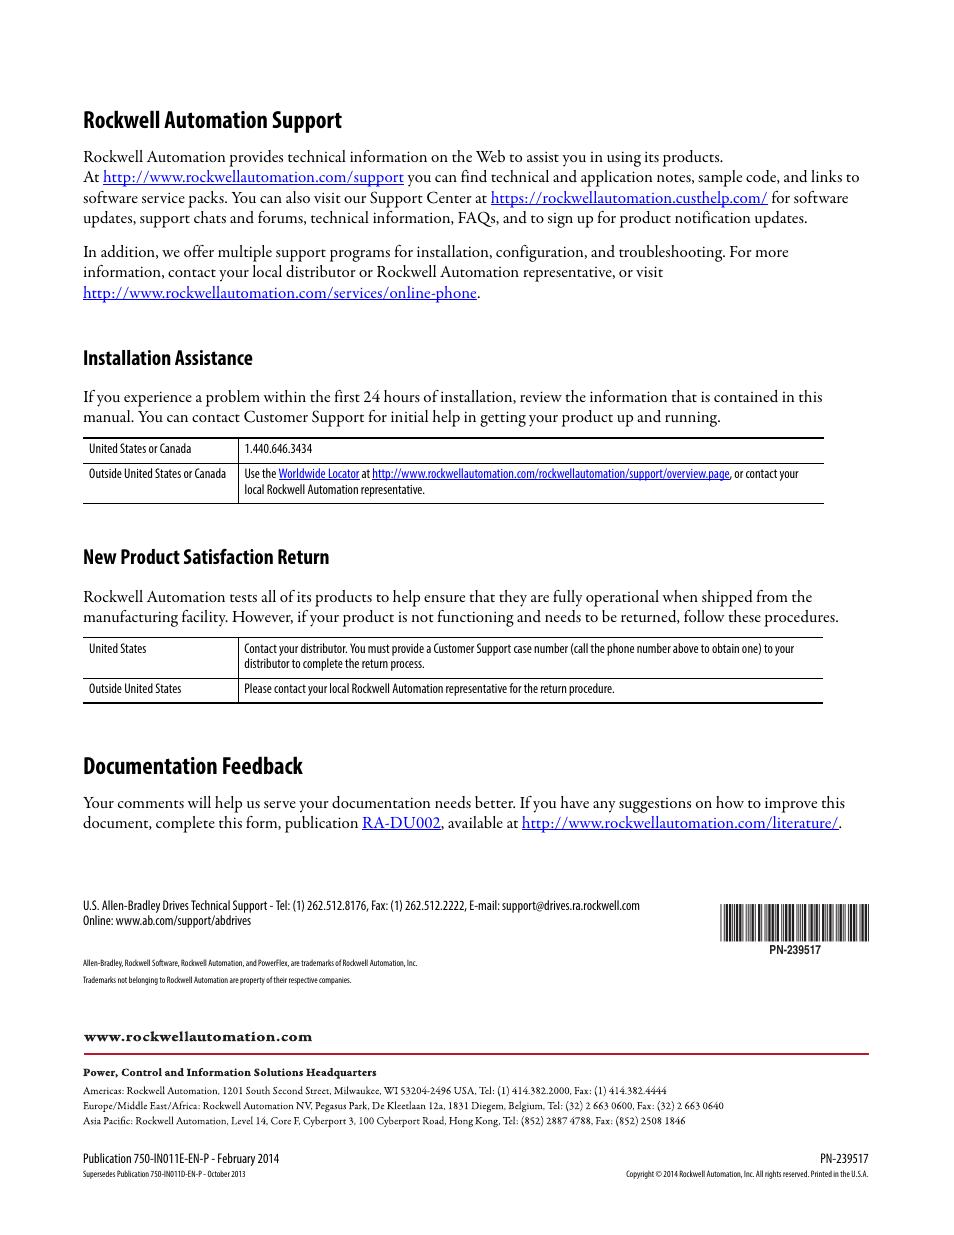 Rockwell automation support, Documentation feedback